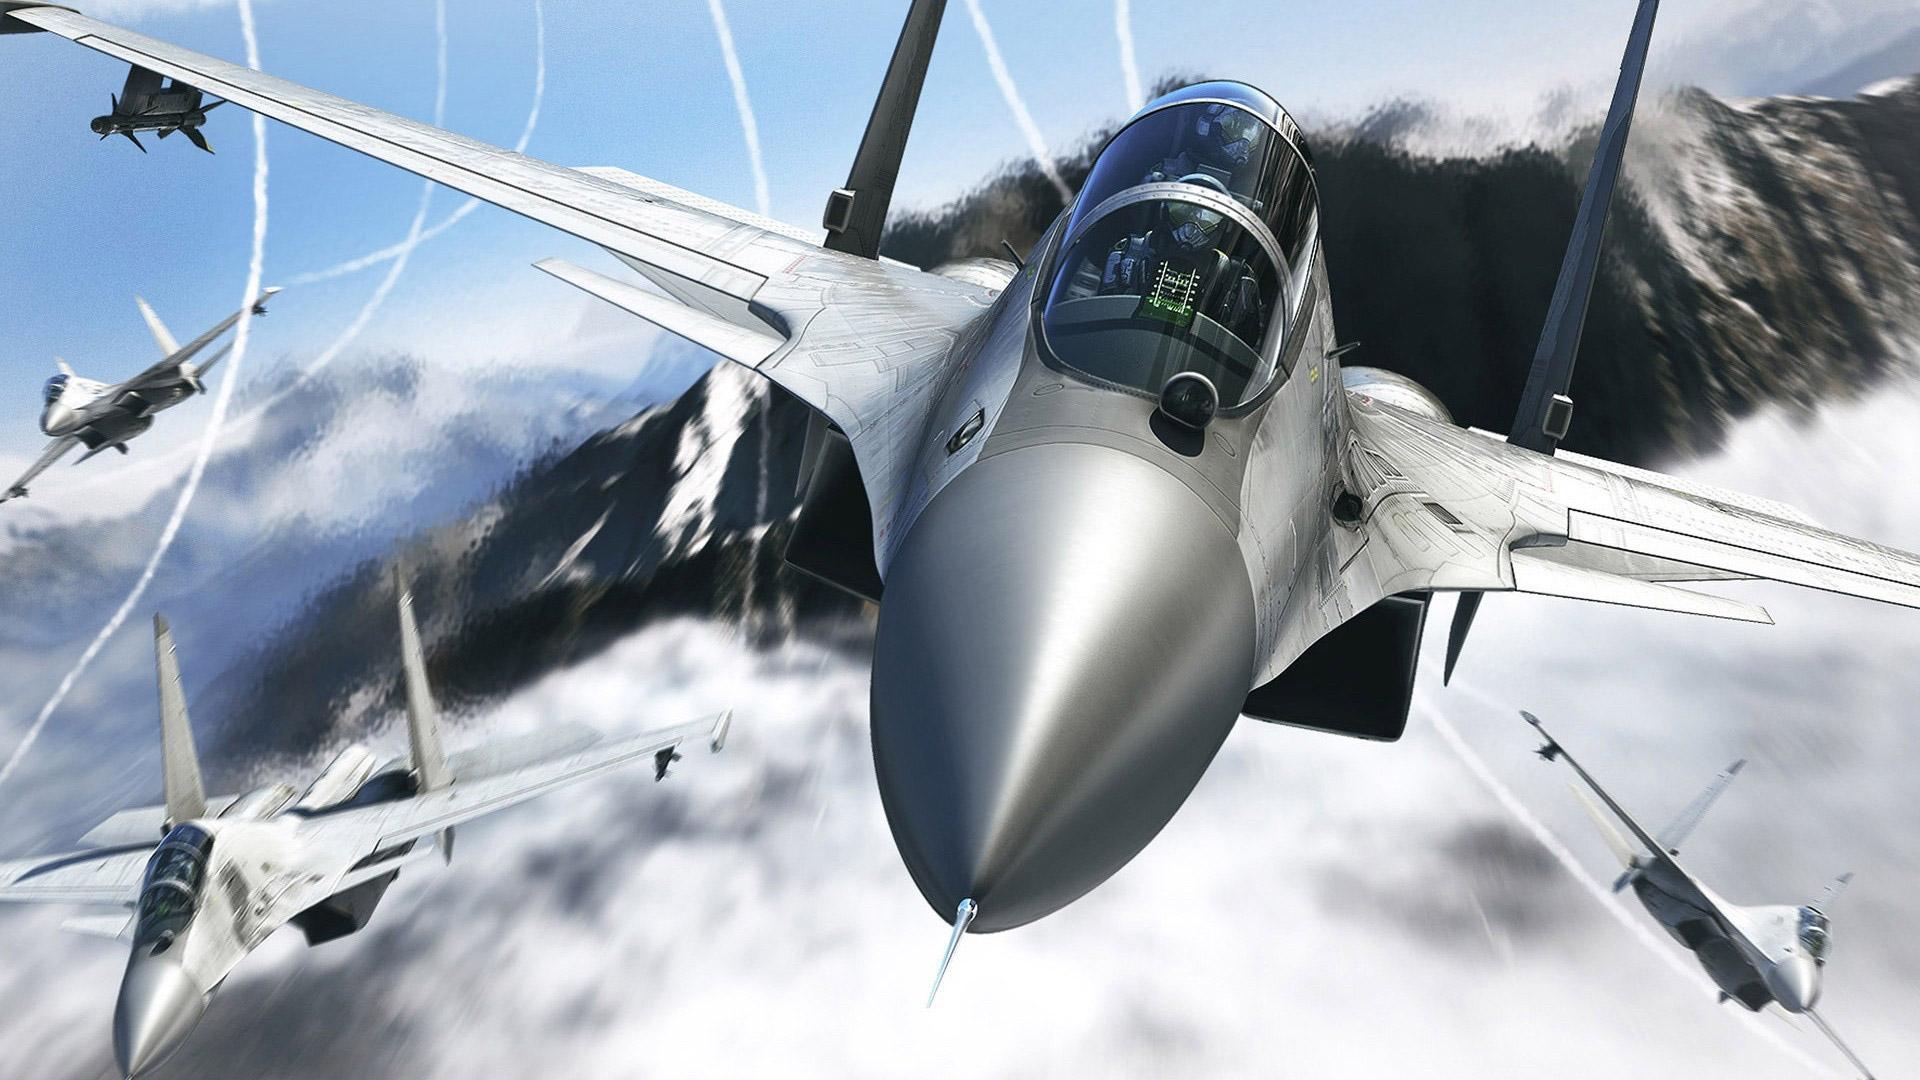 hd wallpaper jet fighter flying wallpapers55com   Best Wallpapers 1920x1080